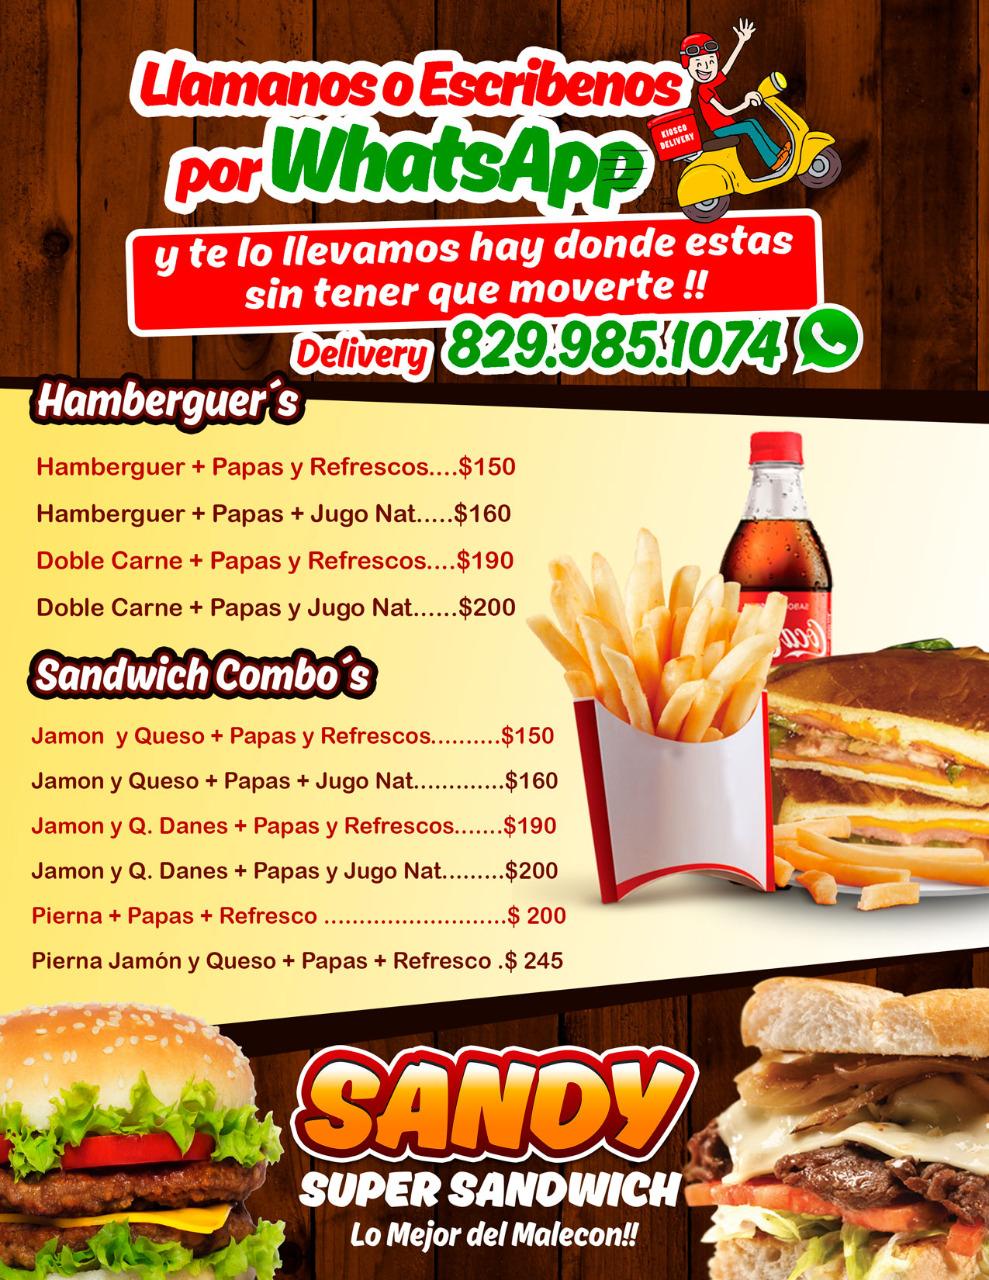 Sandy Super Sándwich, lo mejor del malecon!!